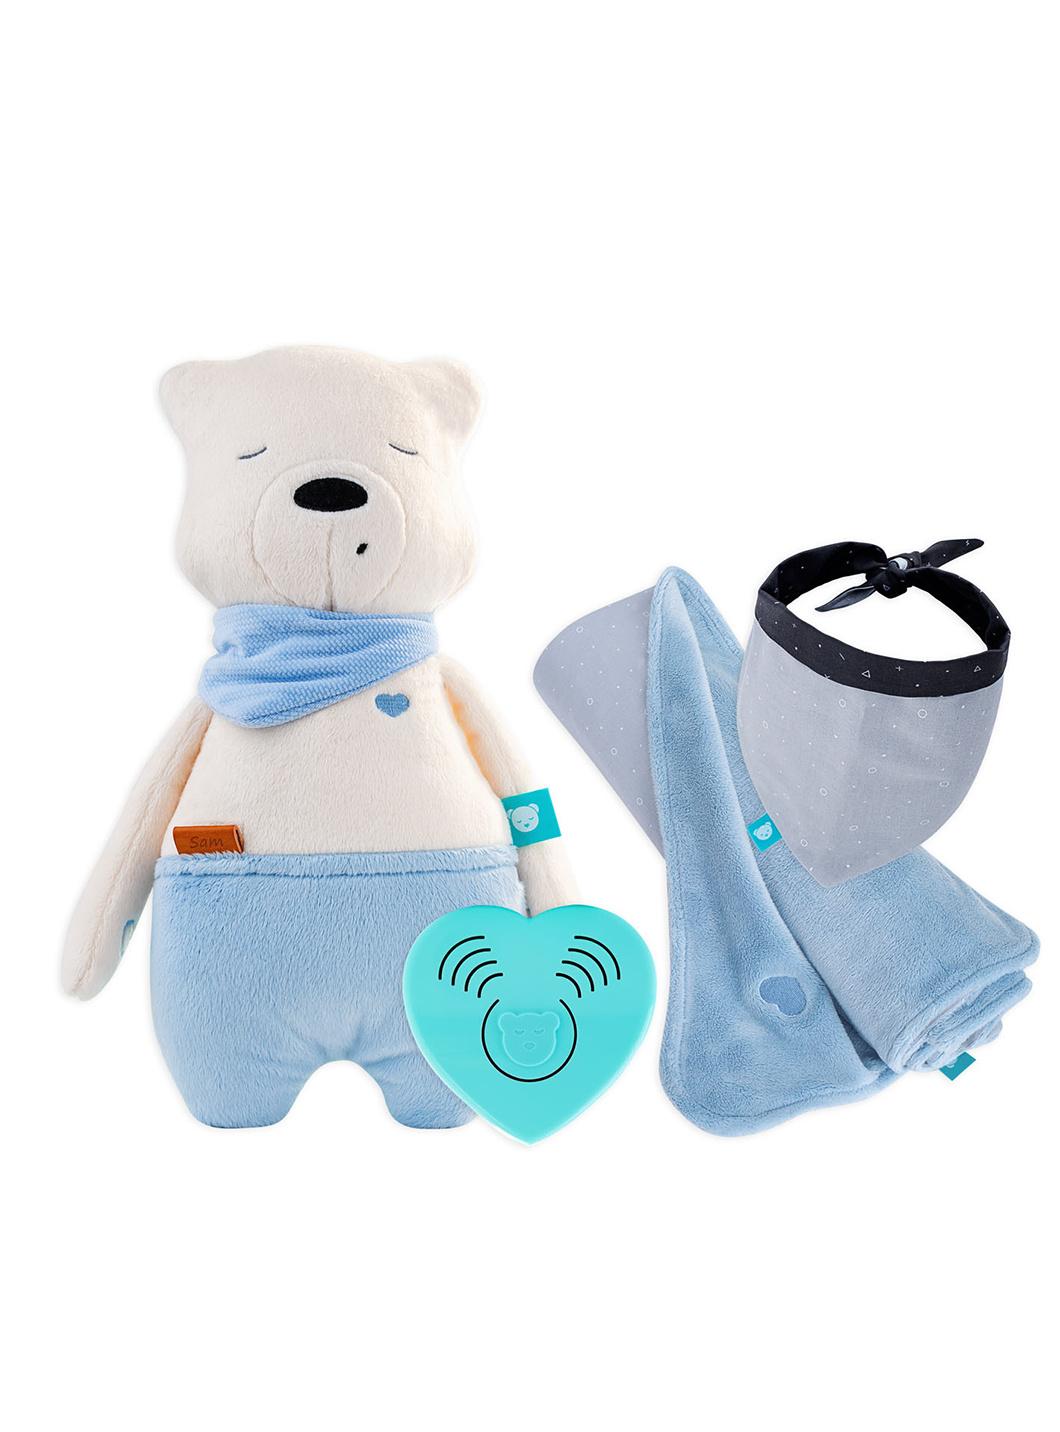 myHummy Set bear with sleep sensor & Favorite Blanket + bandana